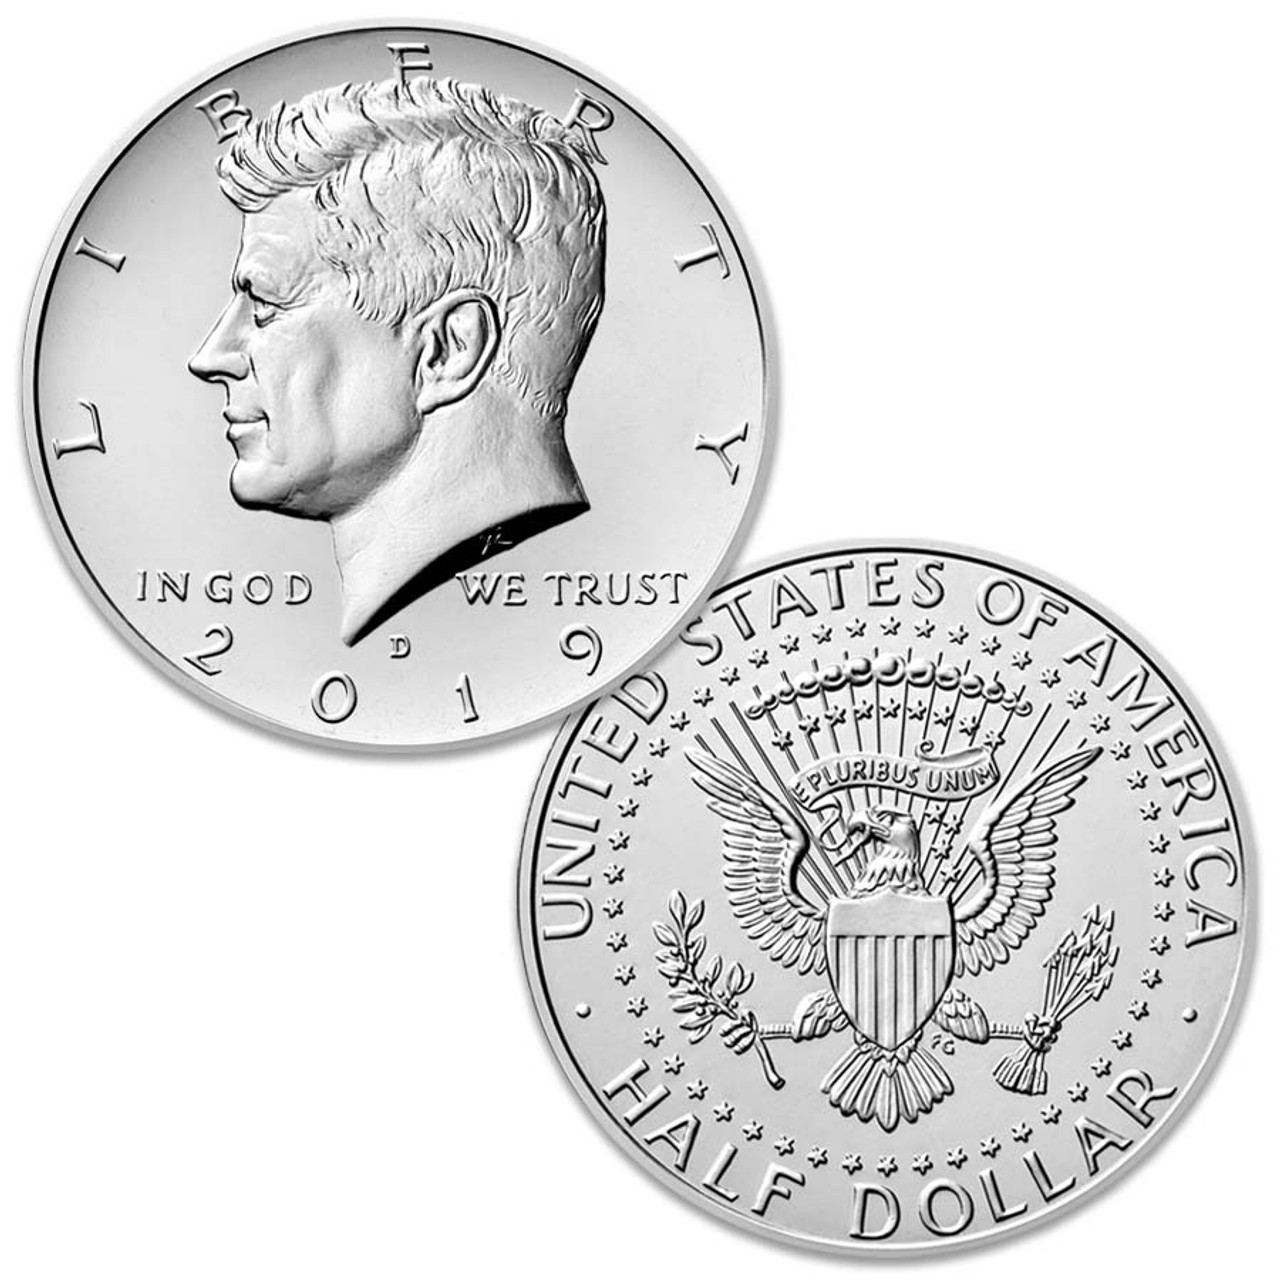 2019-D Kennedy Half Dollar Brilliant Uncirculated Image 1